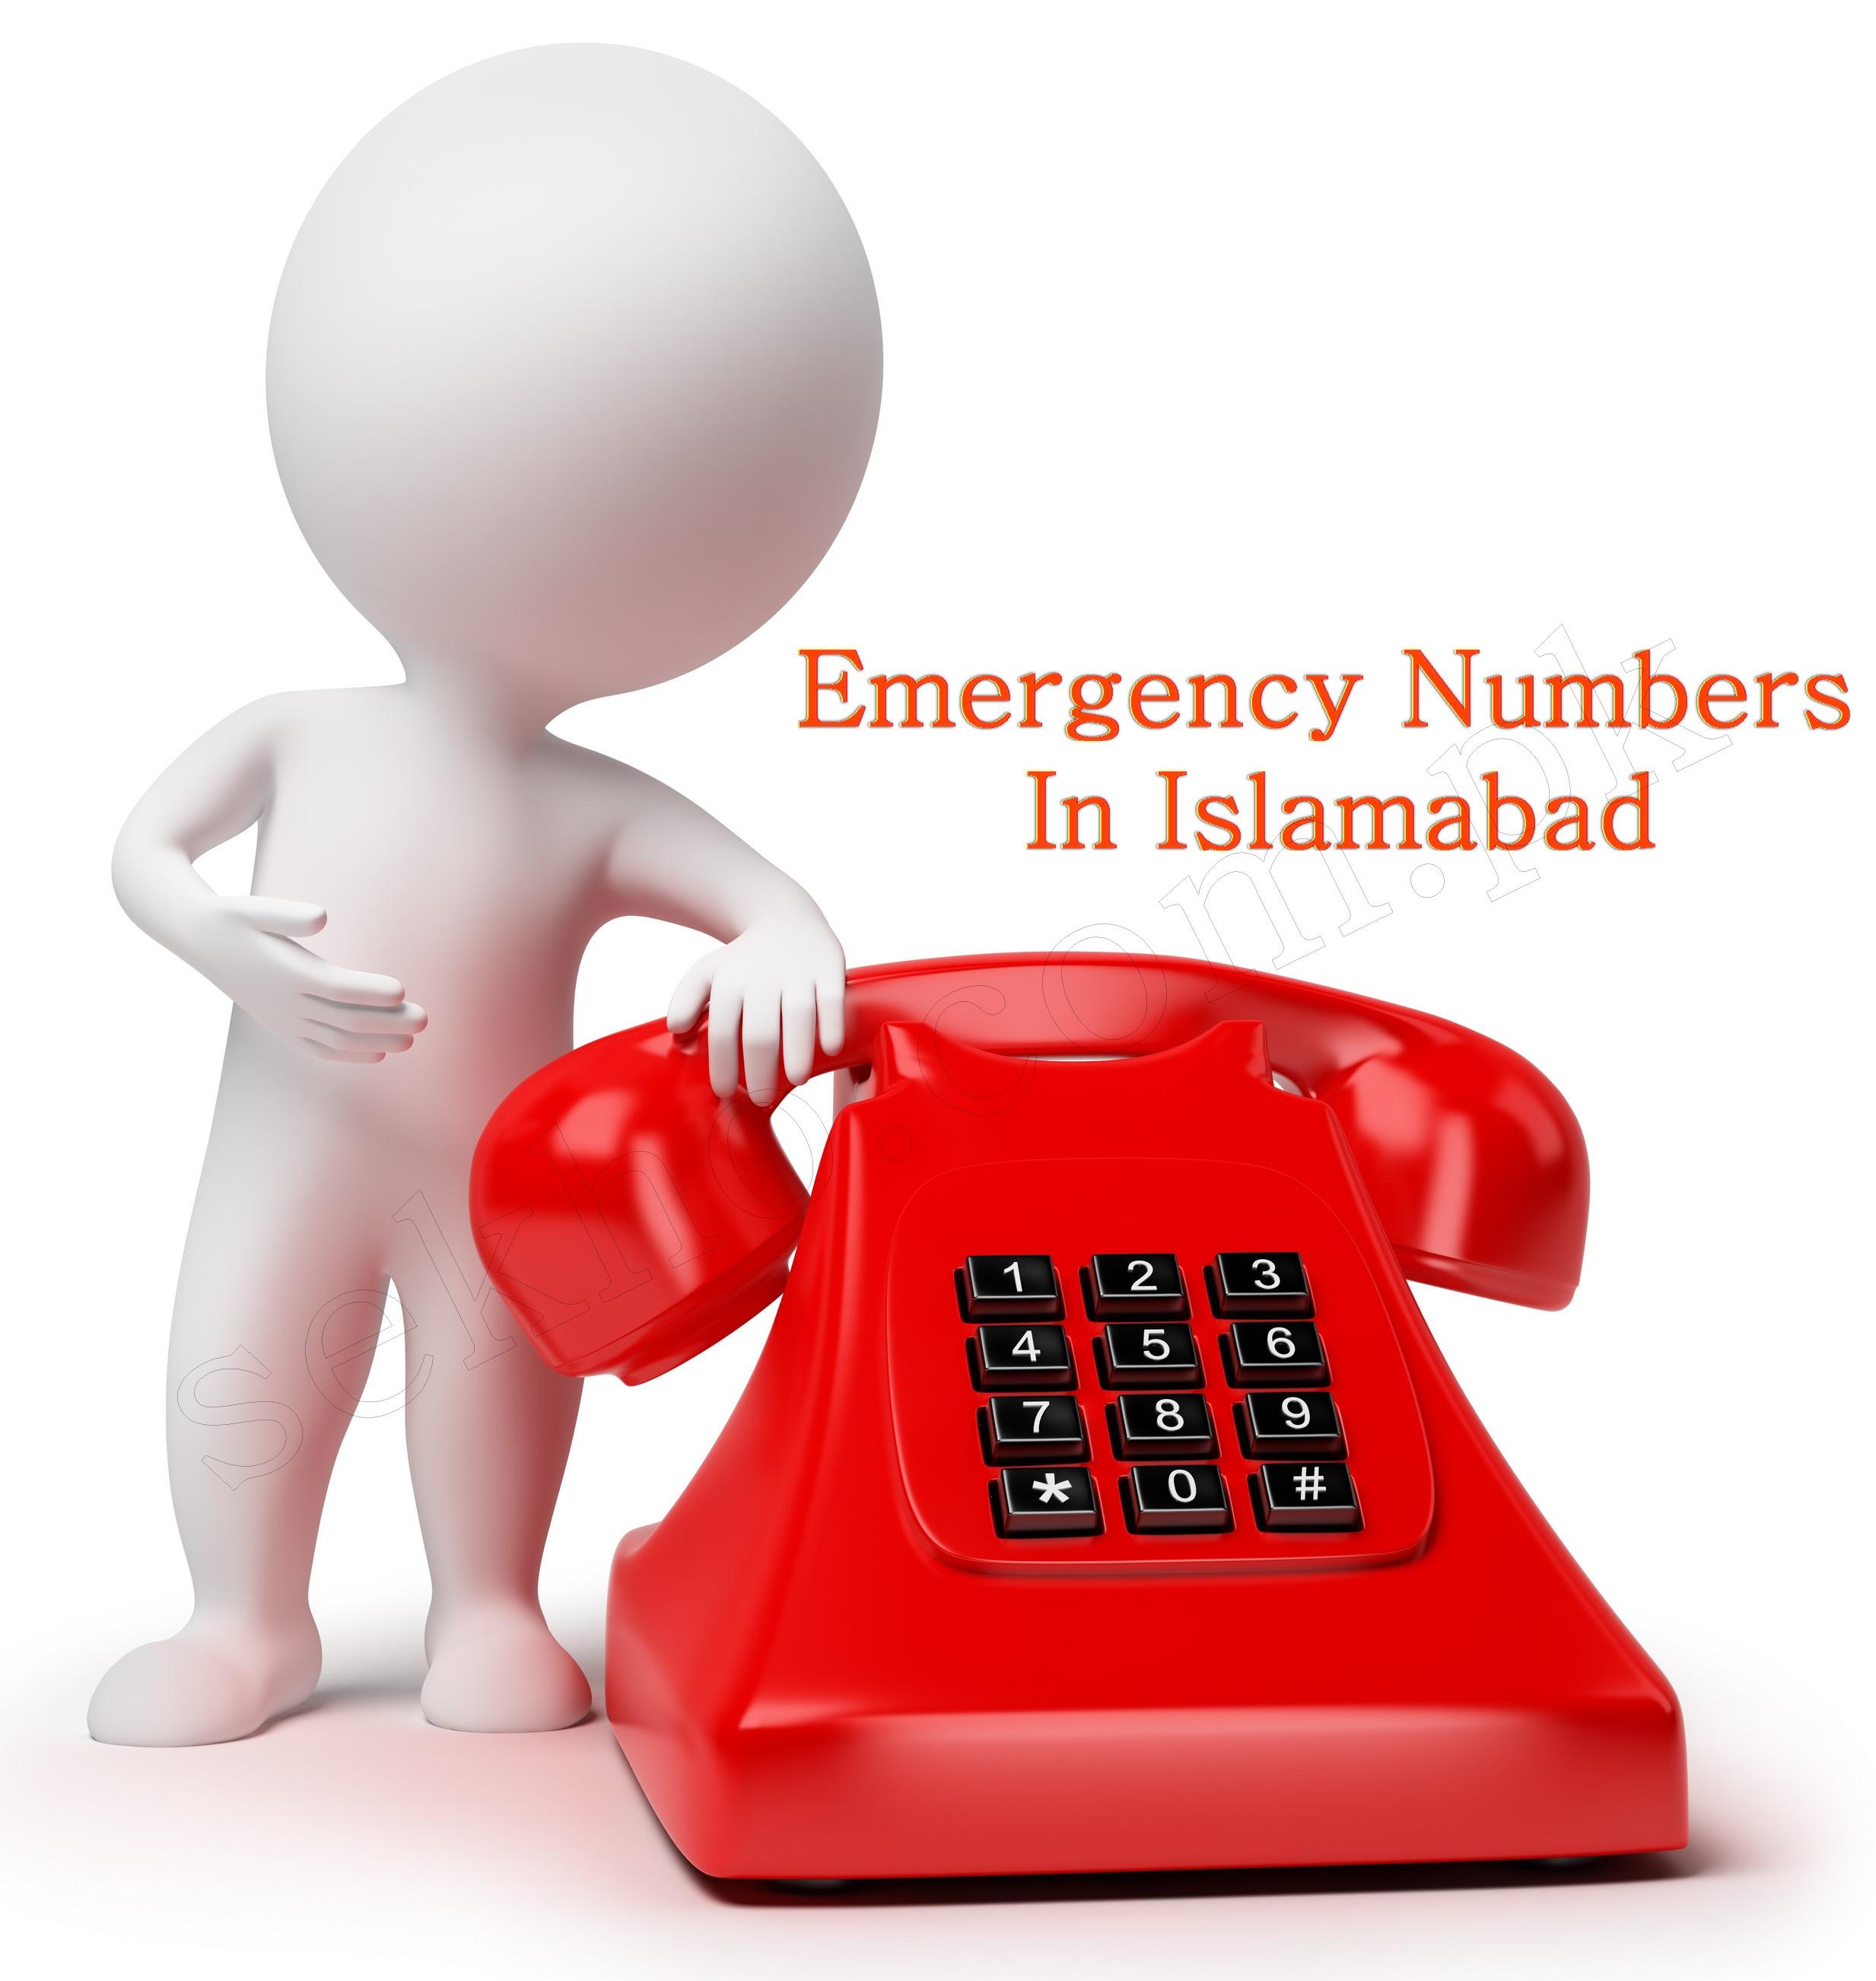 Emergency Telephone Numbers In Islamabad